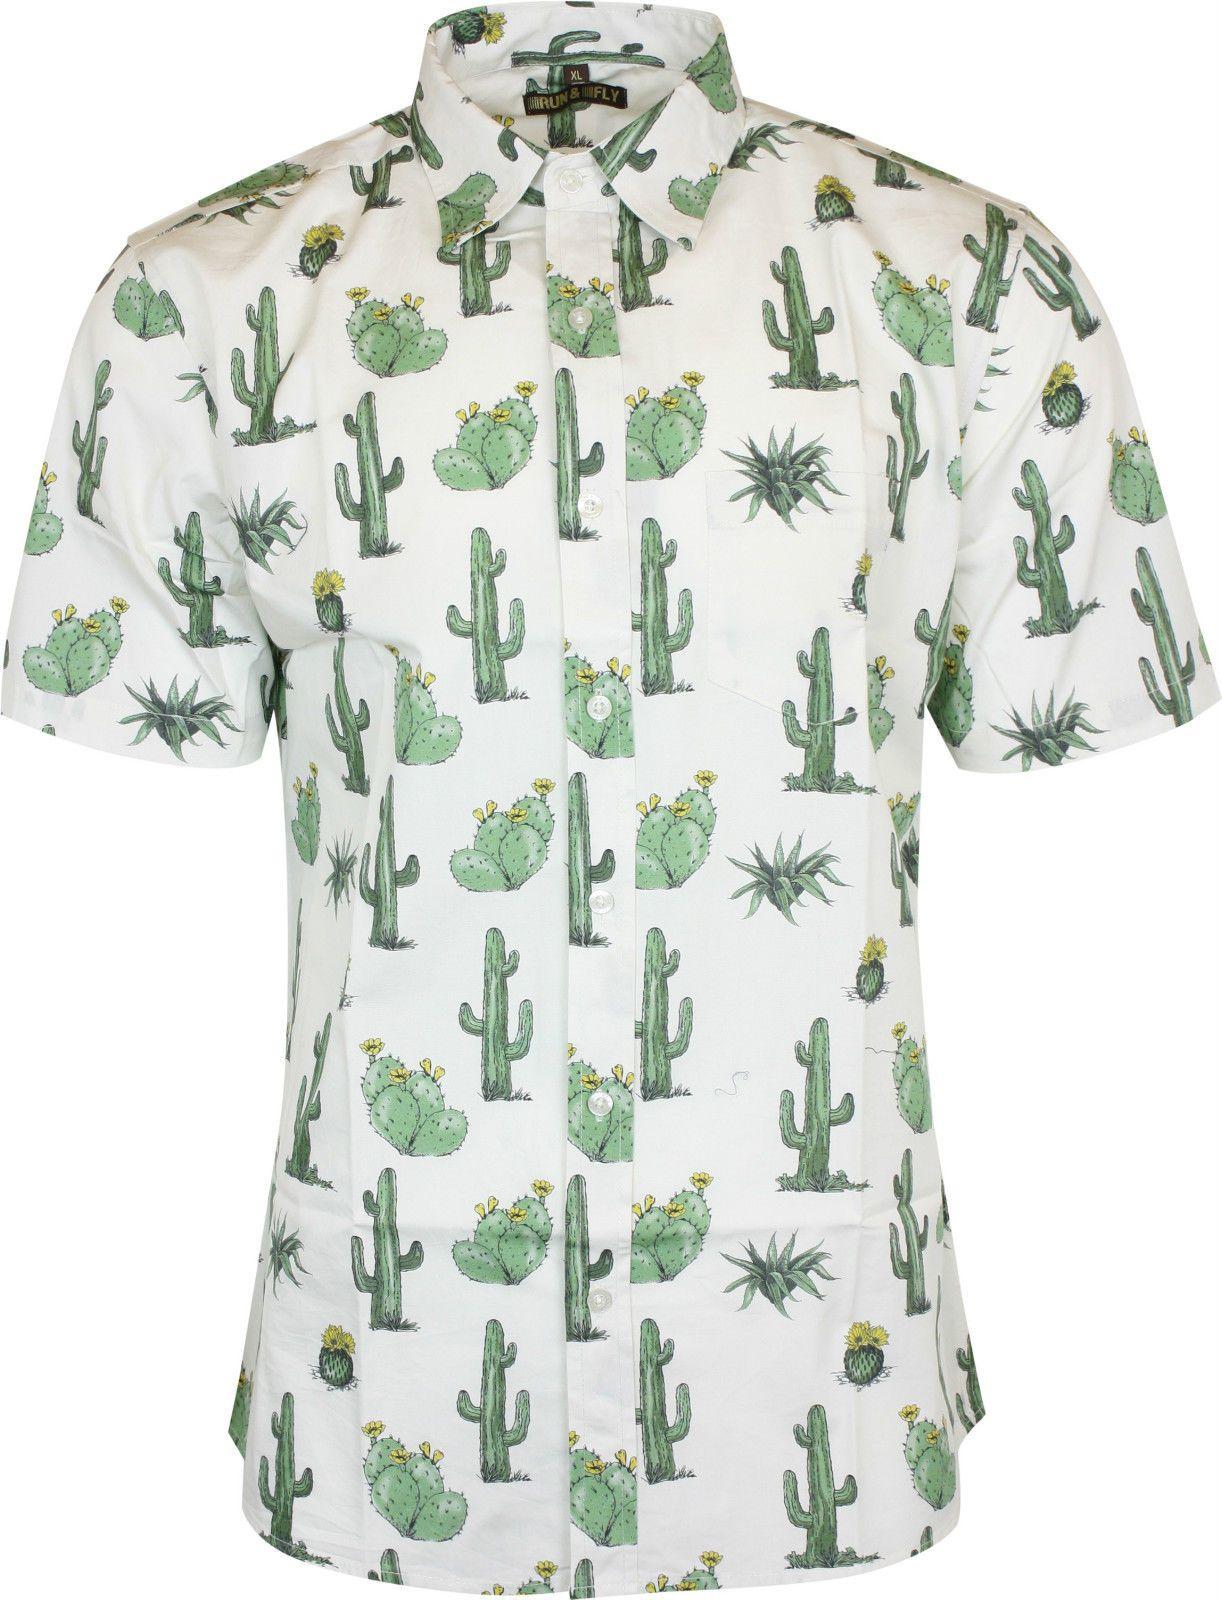 Womens Bowling Shirts